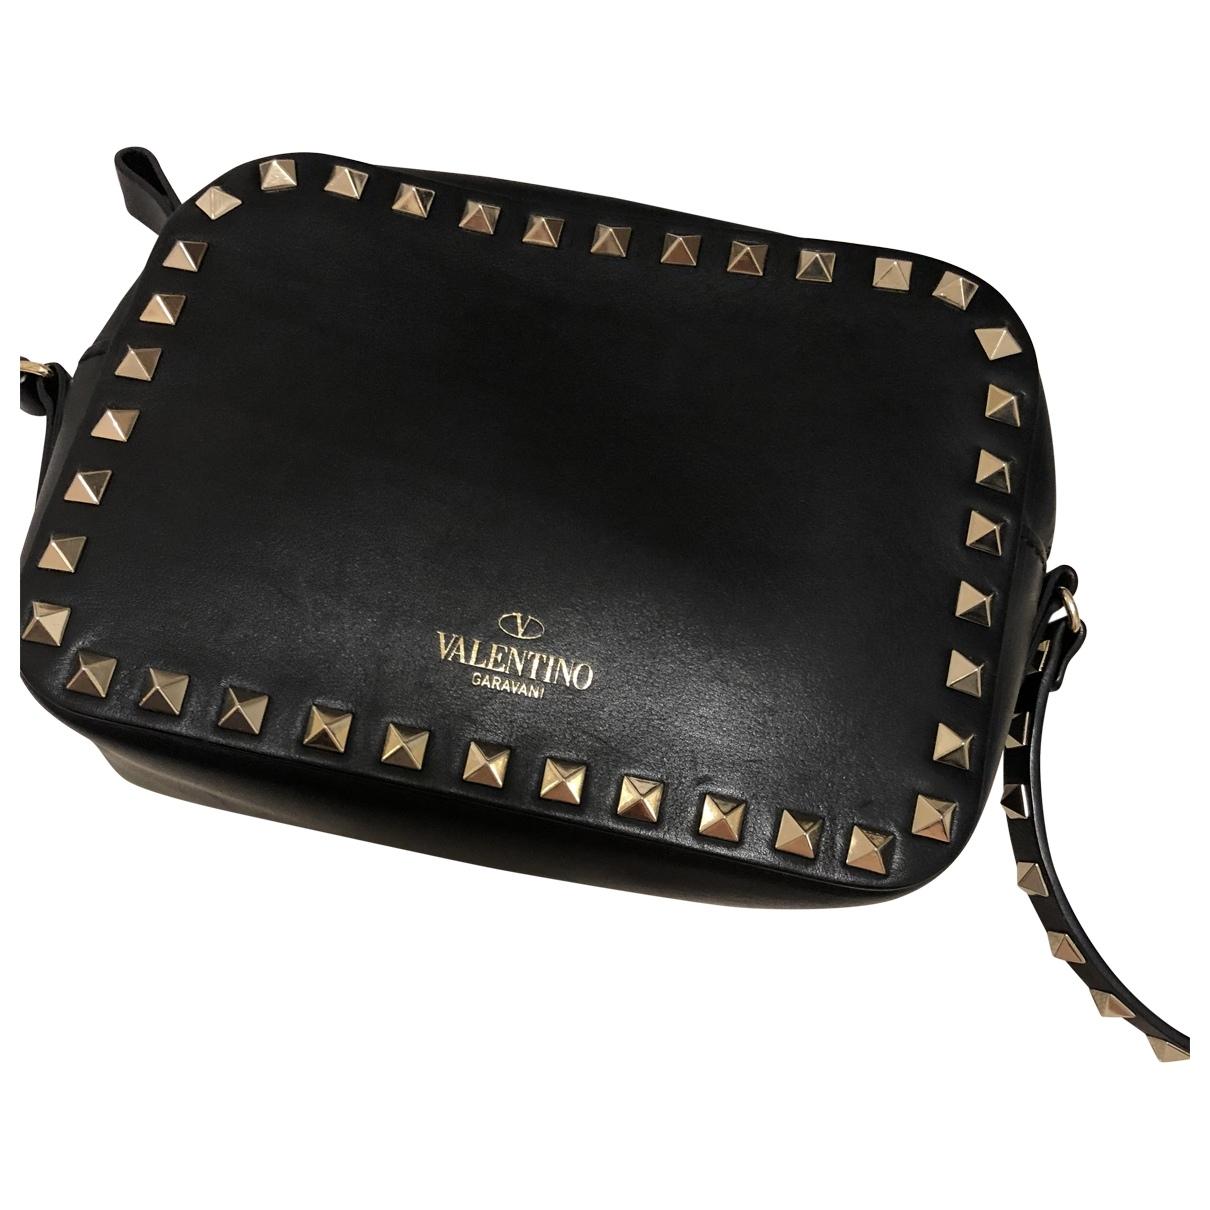 Valentino Garavani Rockstud Black Leather handbag for Women \N